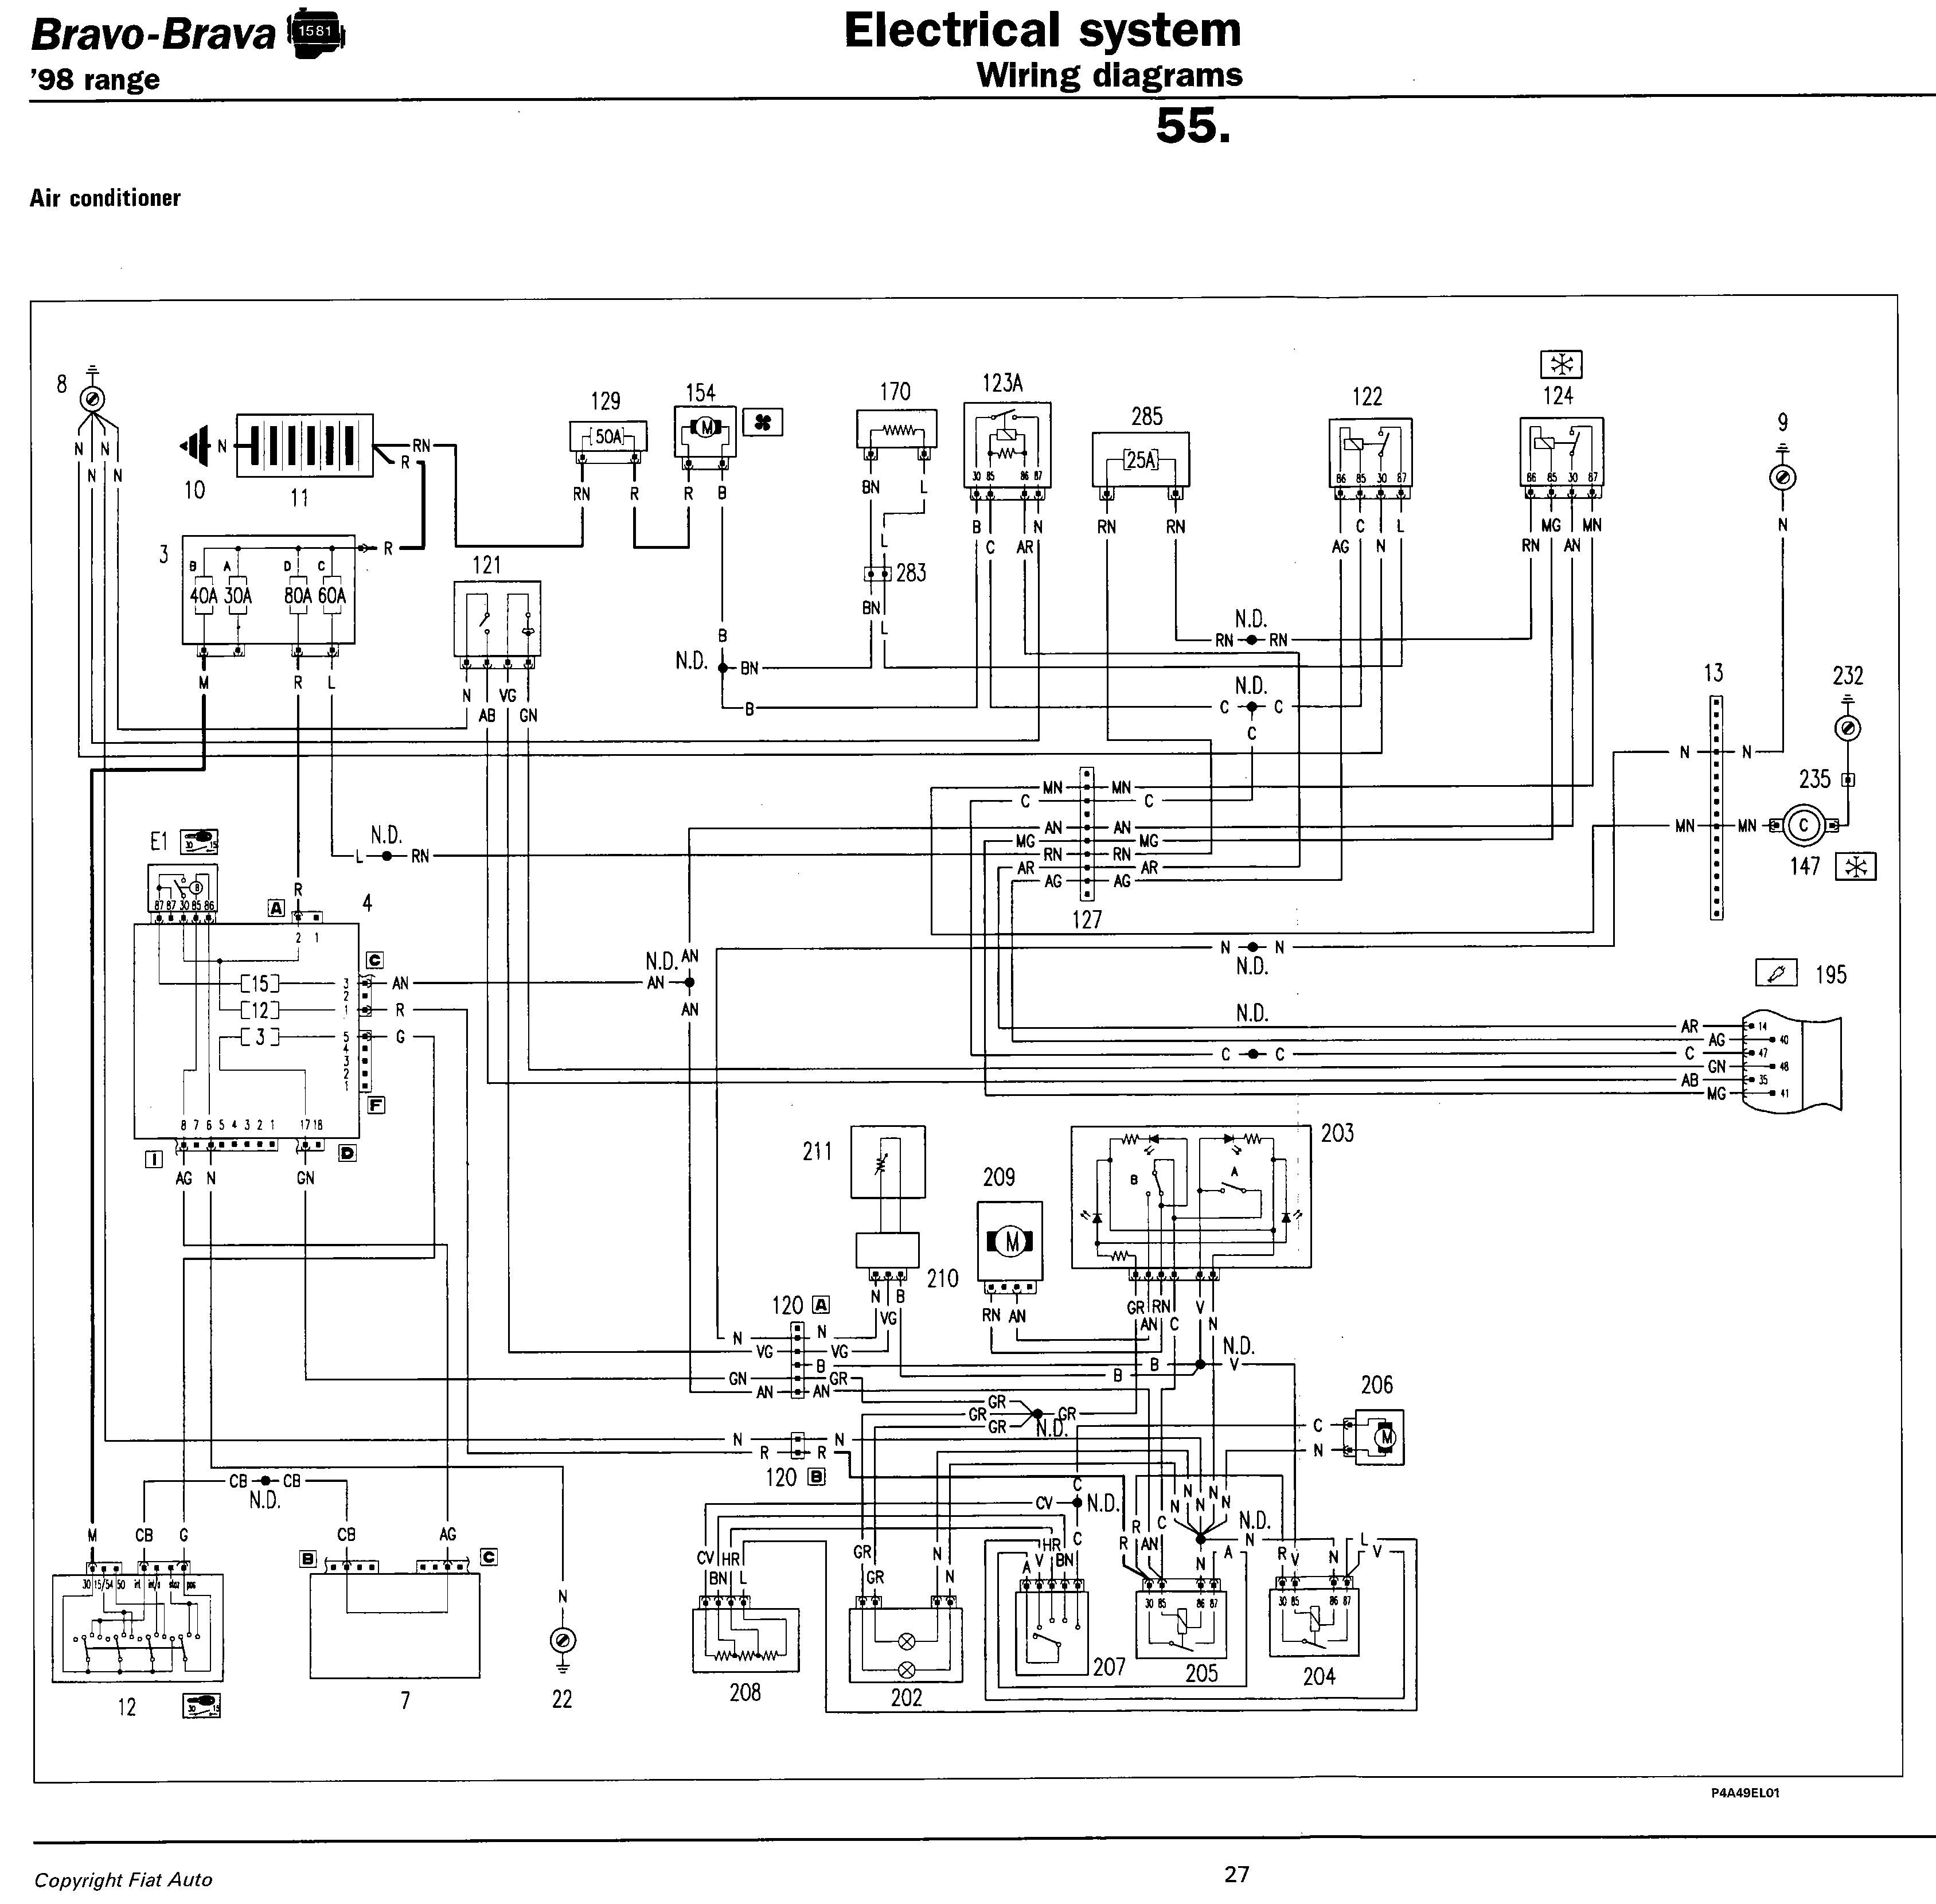 Brilliant Furnace Wiring Box Wiring Diagram Wiring Cloud Licukaidewilluminateatxorg